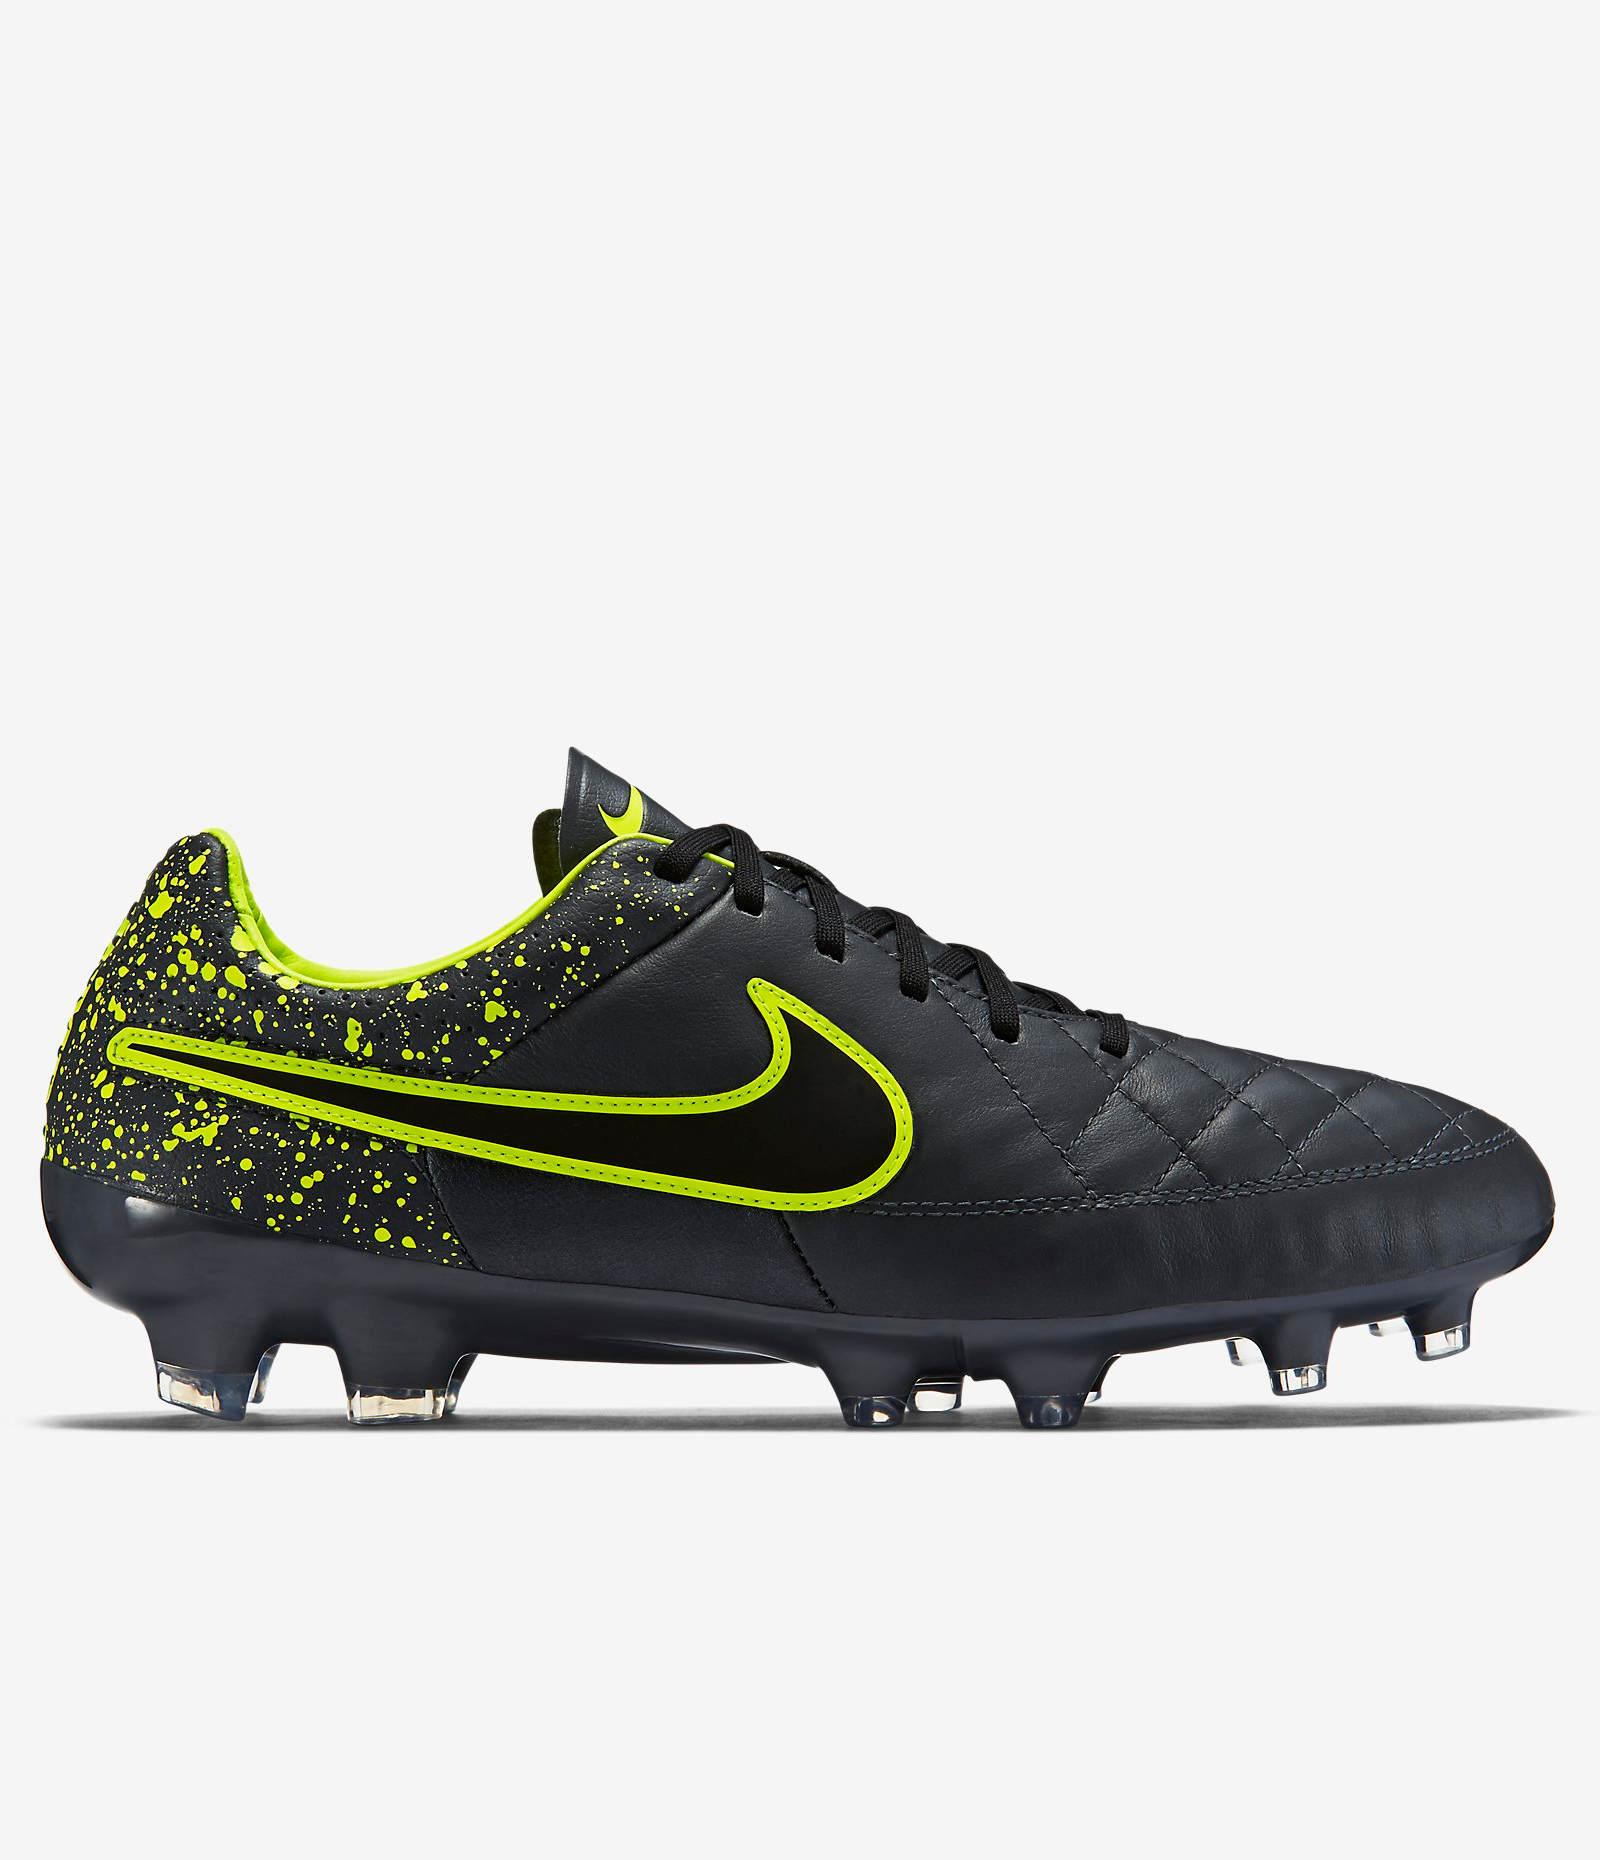 football shoes nike scarpe calcio tiempo legacy fg nero. Black Bedroom Furniture Sets. Home Design Ideas